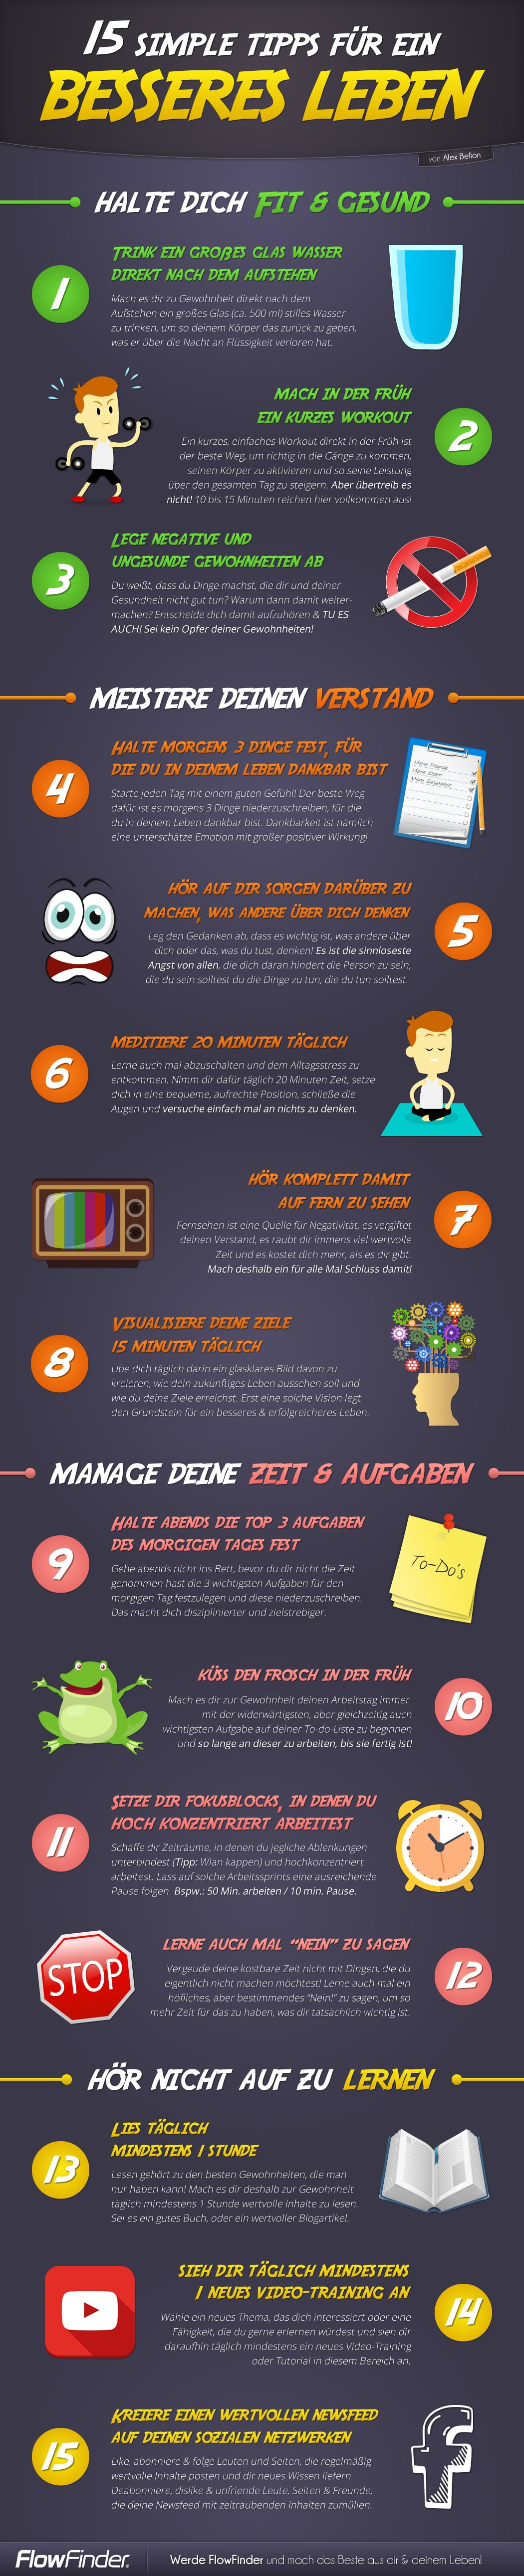 Infografik zum Thema besser leben